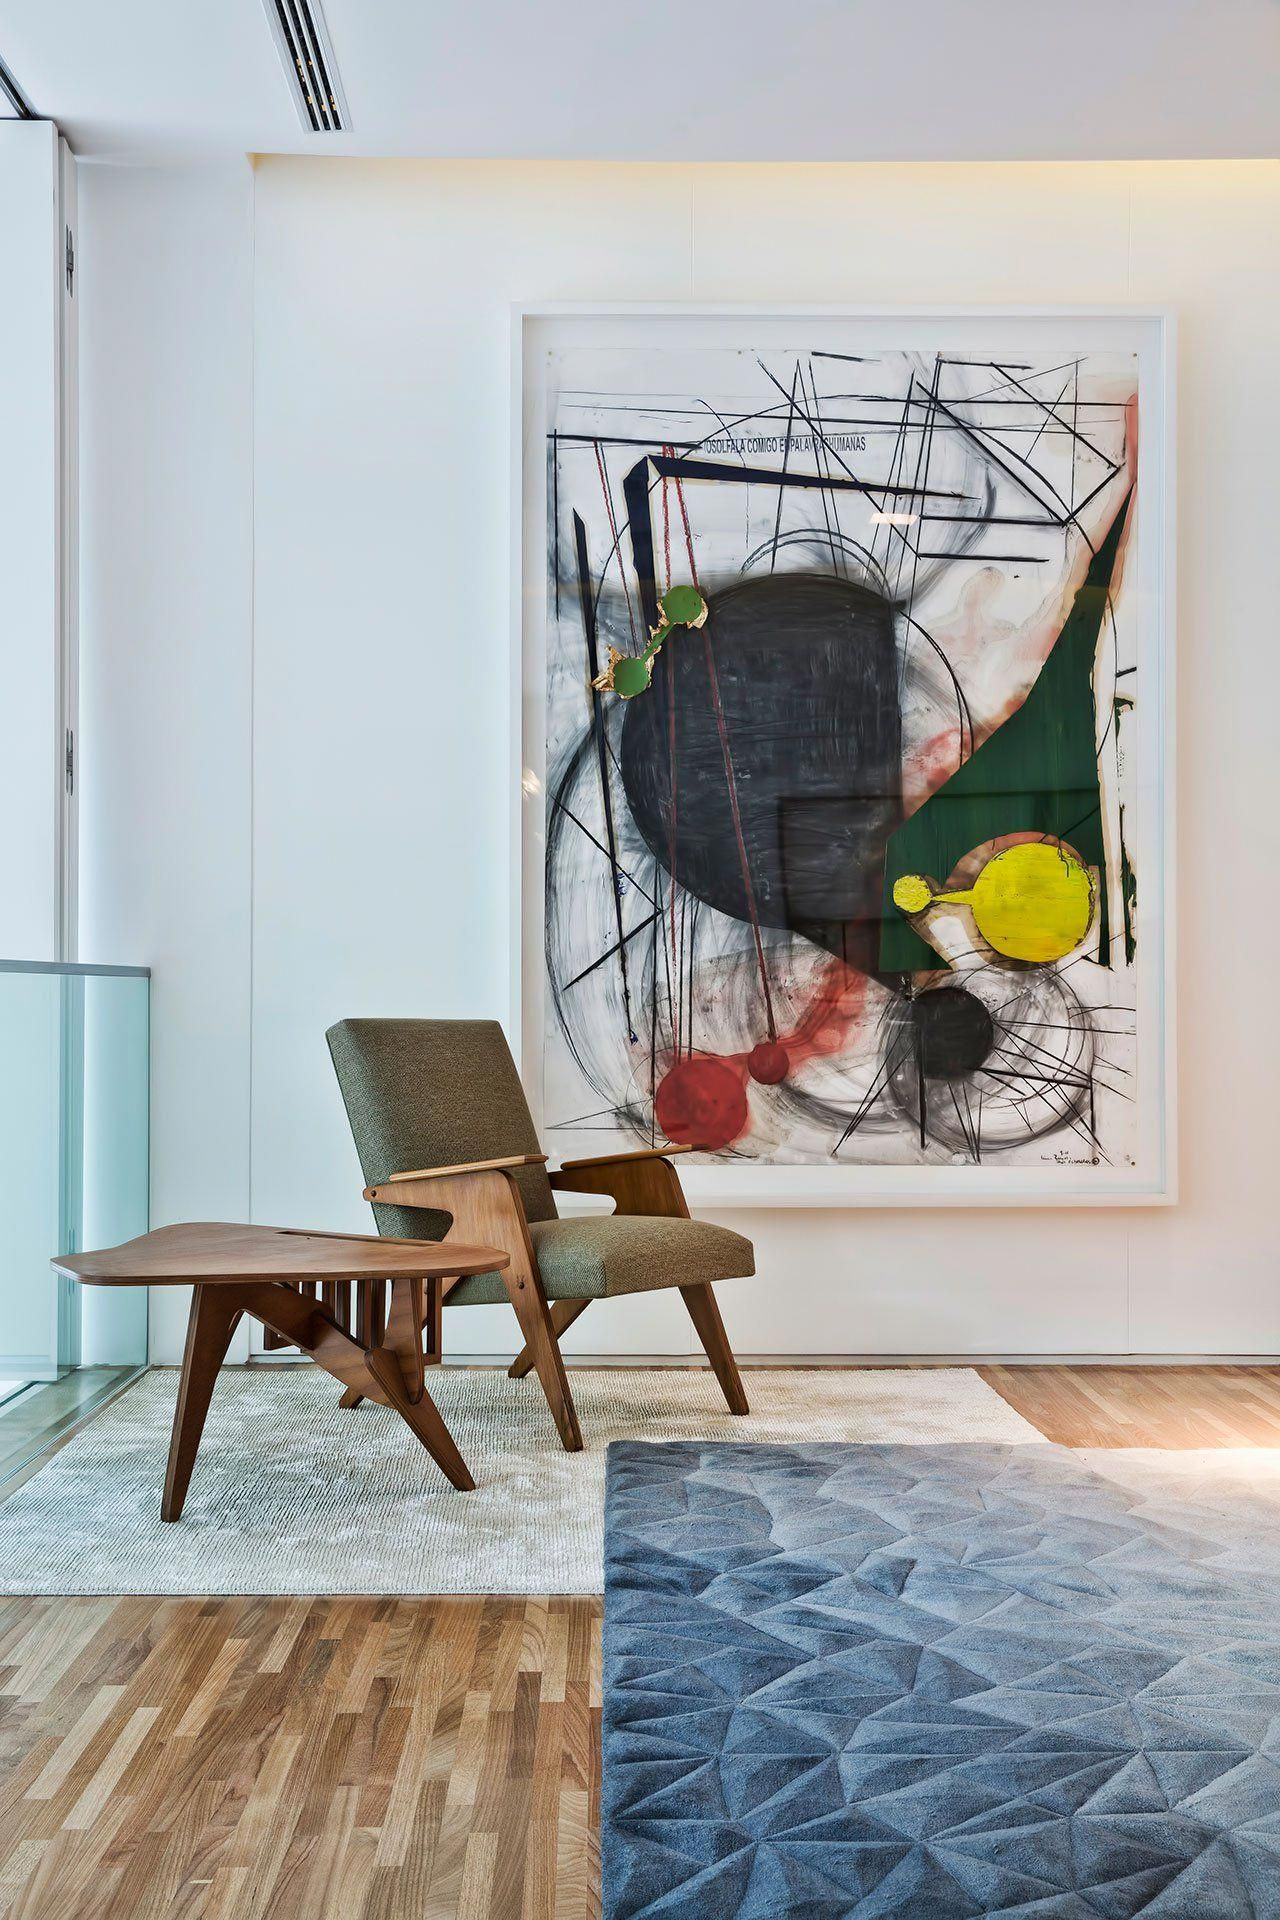 Photo fillippo bamberghi sweet home make interior decoration design ideas decor styles also rh pinterest